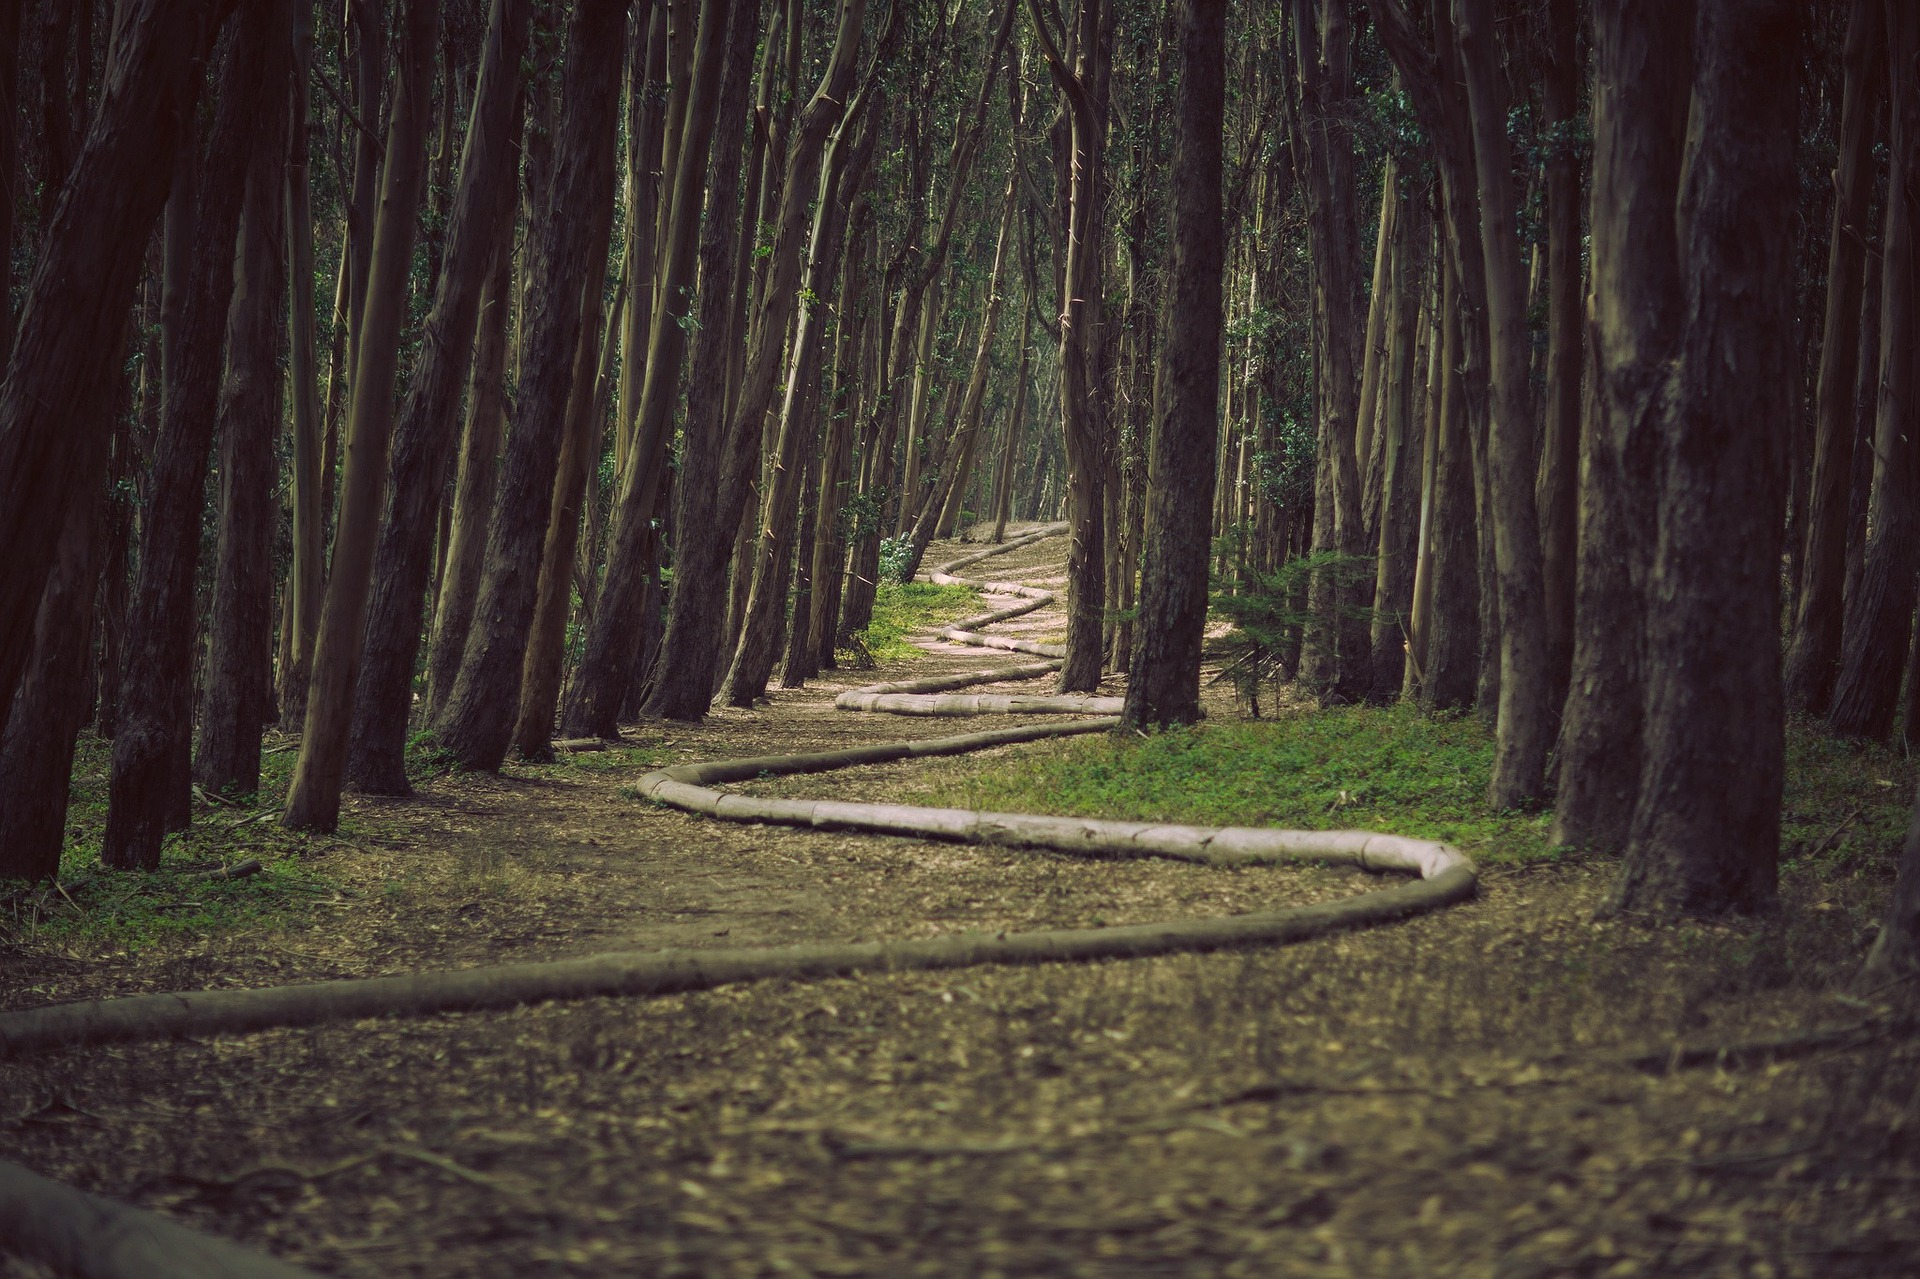 forest-336496_1920.jpg